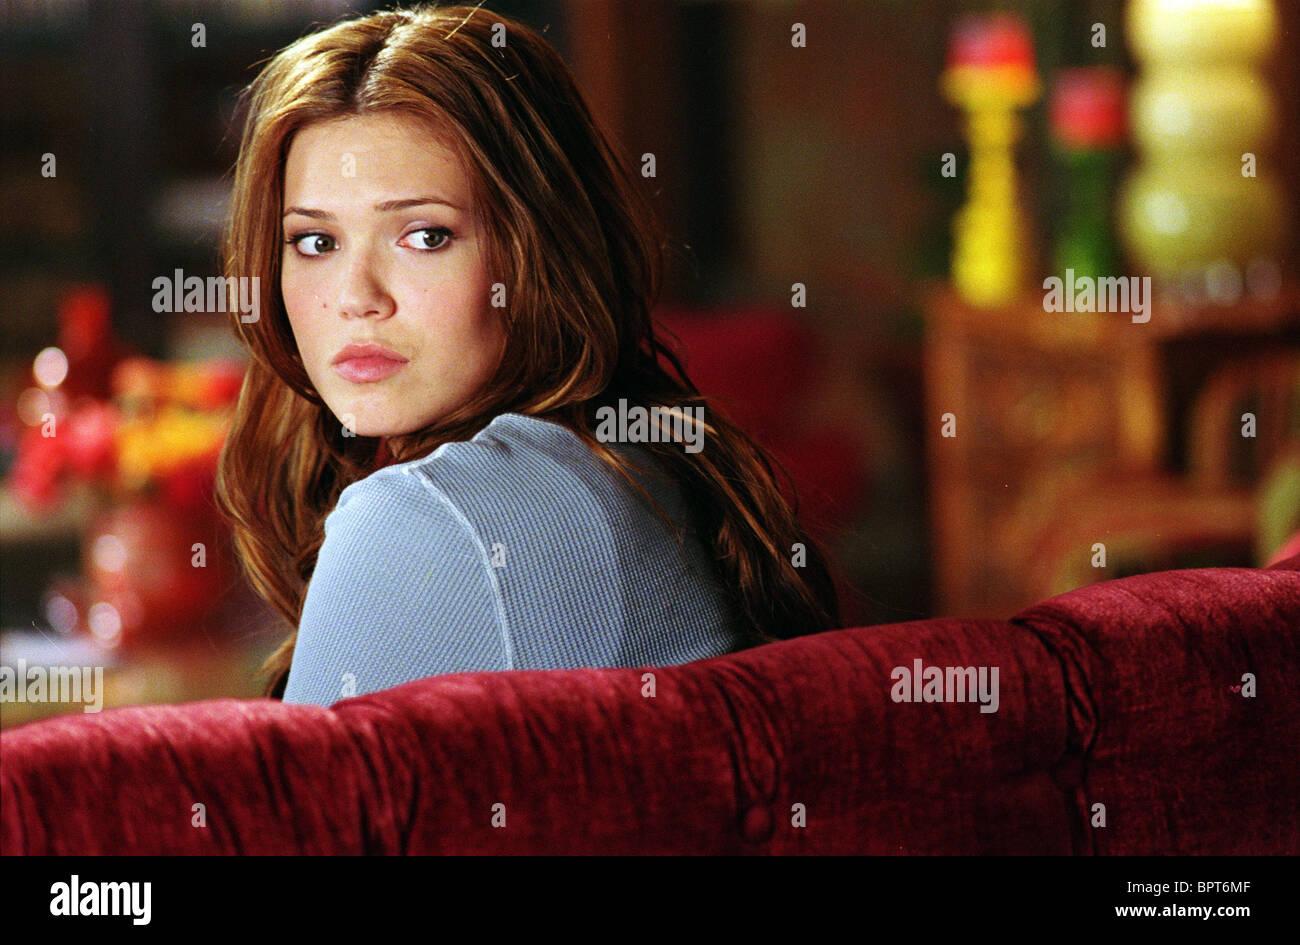 MANDY MOORE BECAUSE I SAID SO (2007) - Stock Image